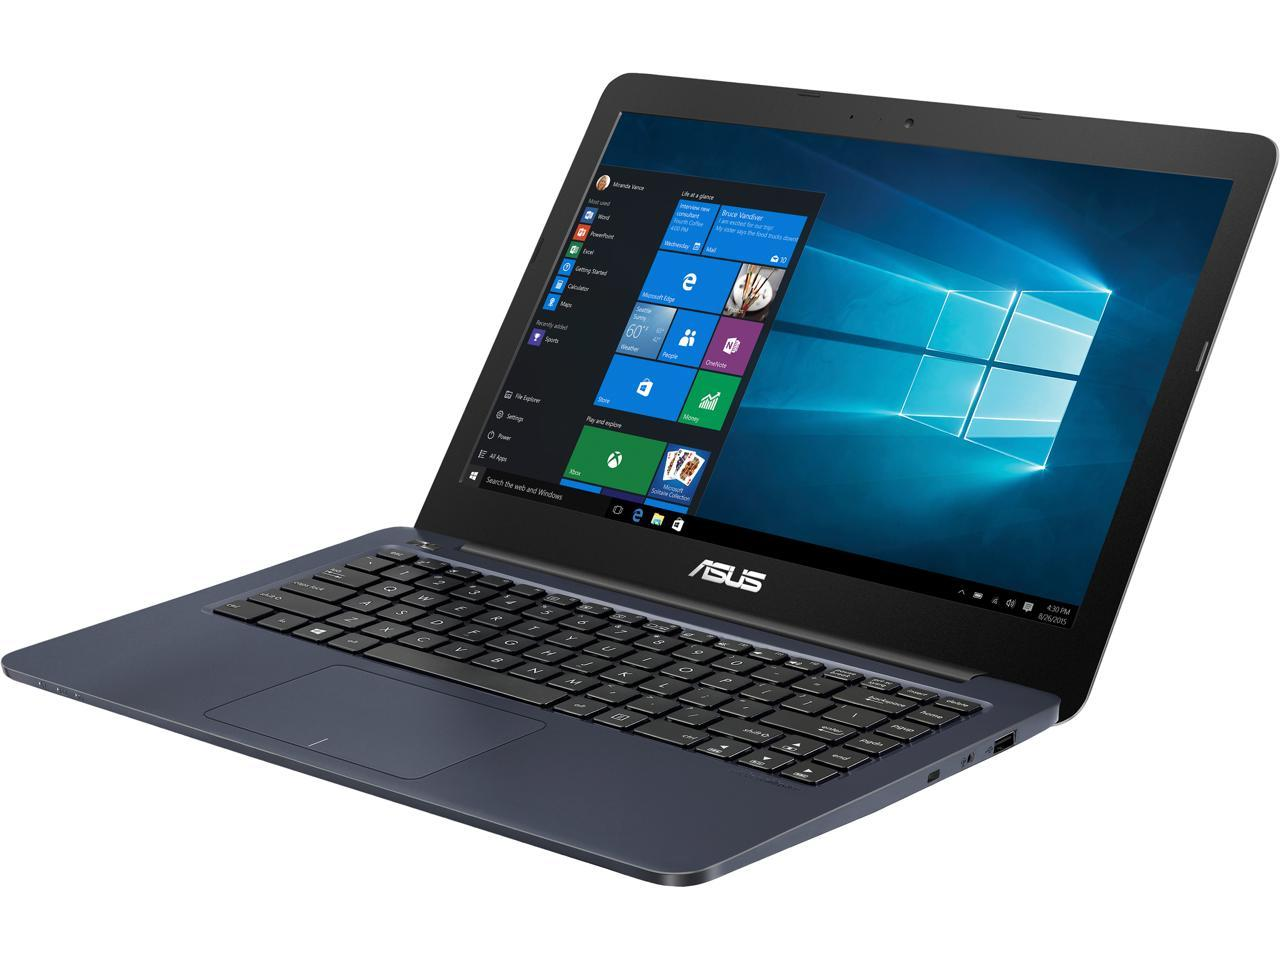 Asus Vivobook F402ba Eb91 14 Thin And Light Laptop Dual Core Amd A9 Processor Radeon R5 Graphics 8 Gb Ddr3 Ram 1 Tb 5400 Rpm Hdd Usb Type C Windows 10 Newegg Com